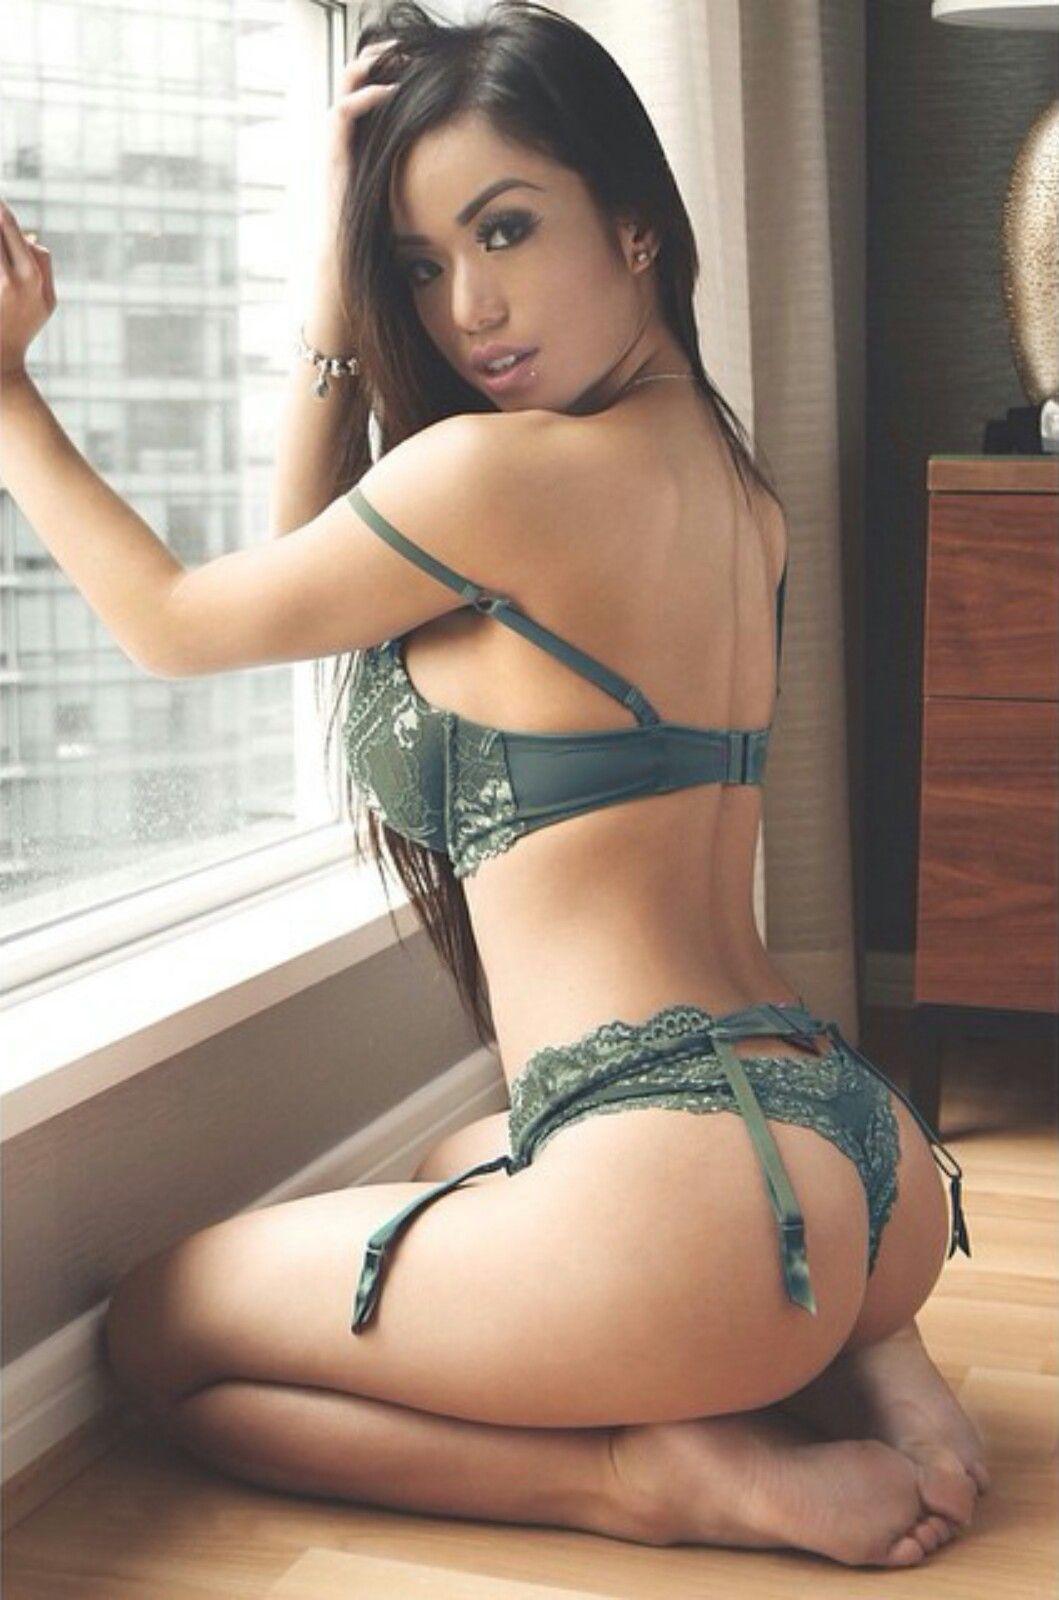 Asian ass in the air